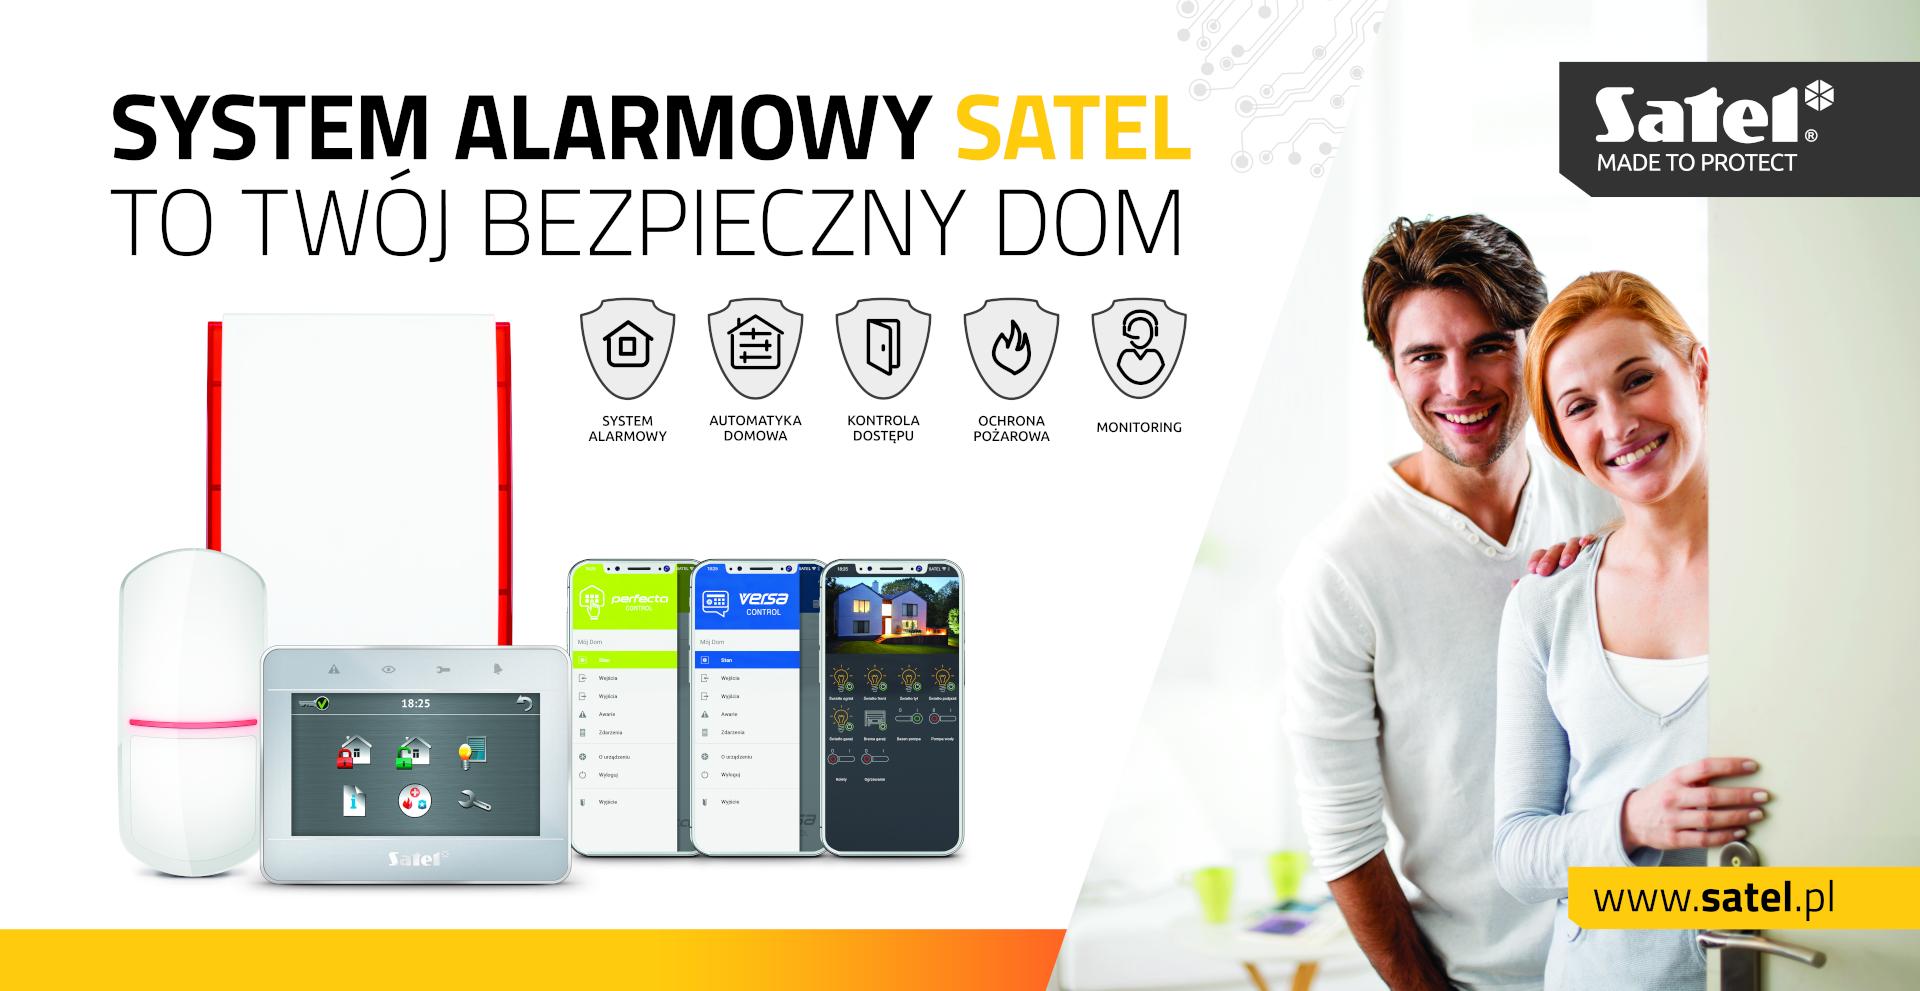 SATEL systemy alarmowe